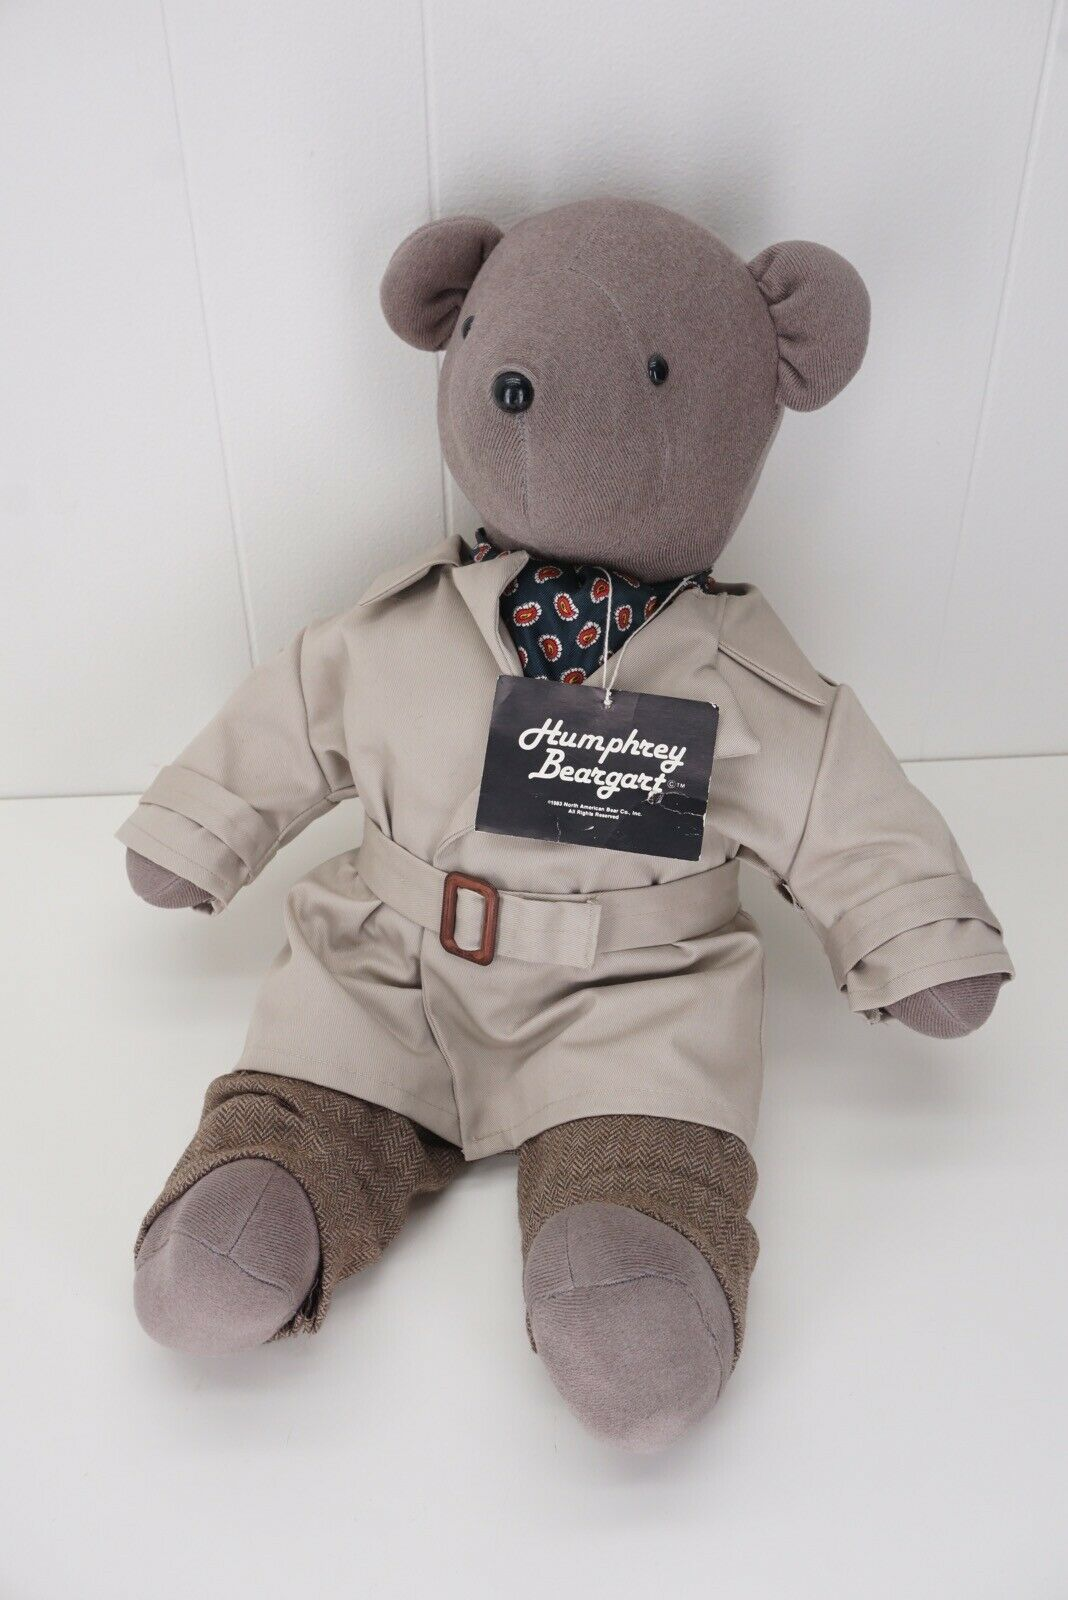 HUMPHREY BEARGART Vintage North American Bear Co Full House Mr Bear 1983 Plush